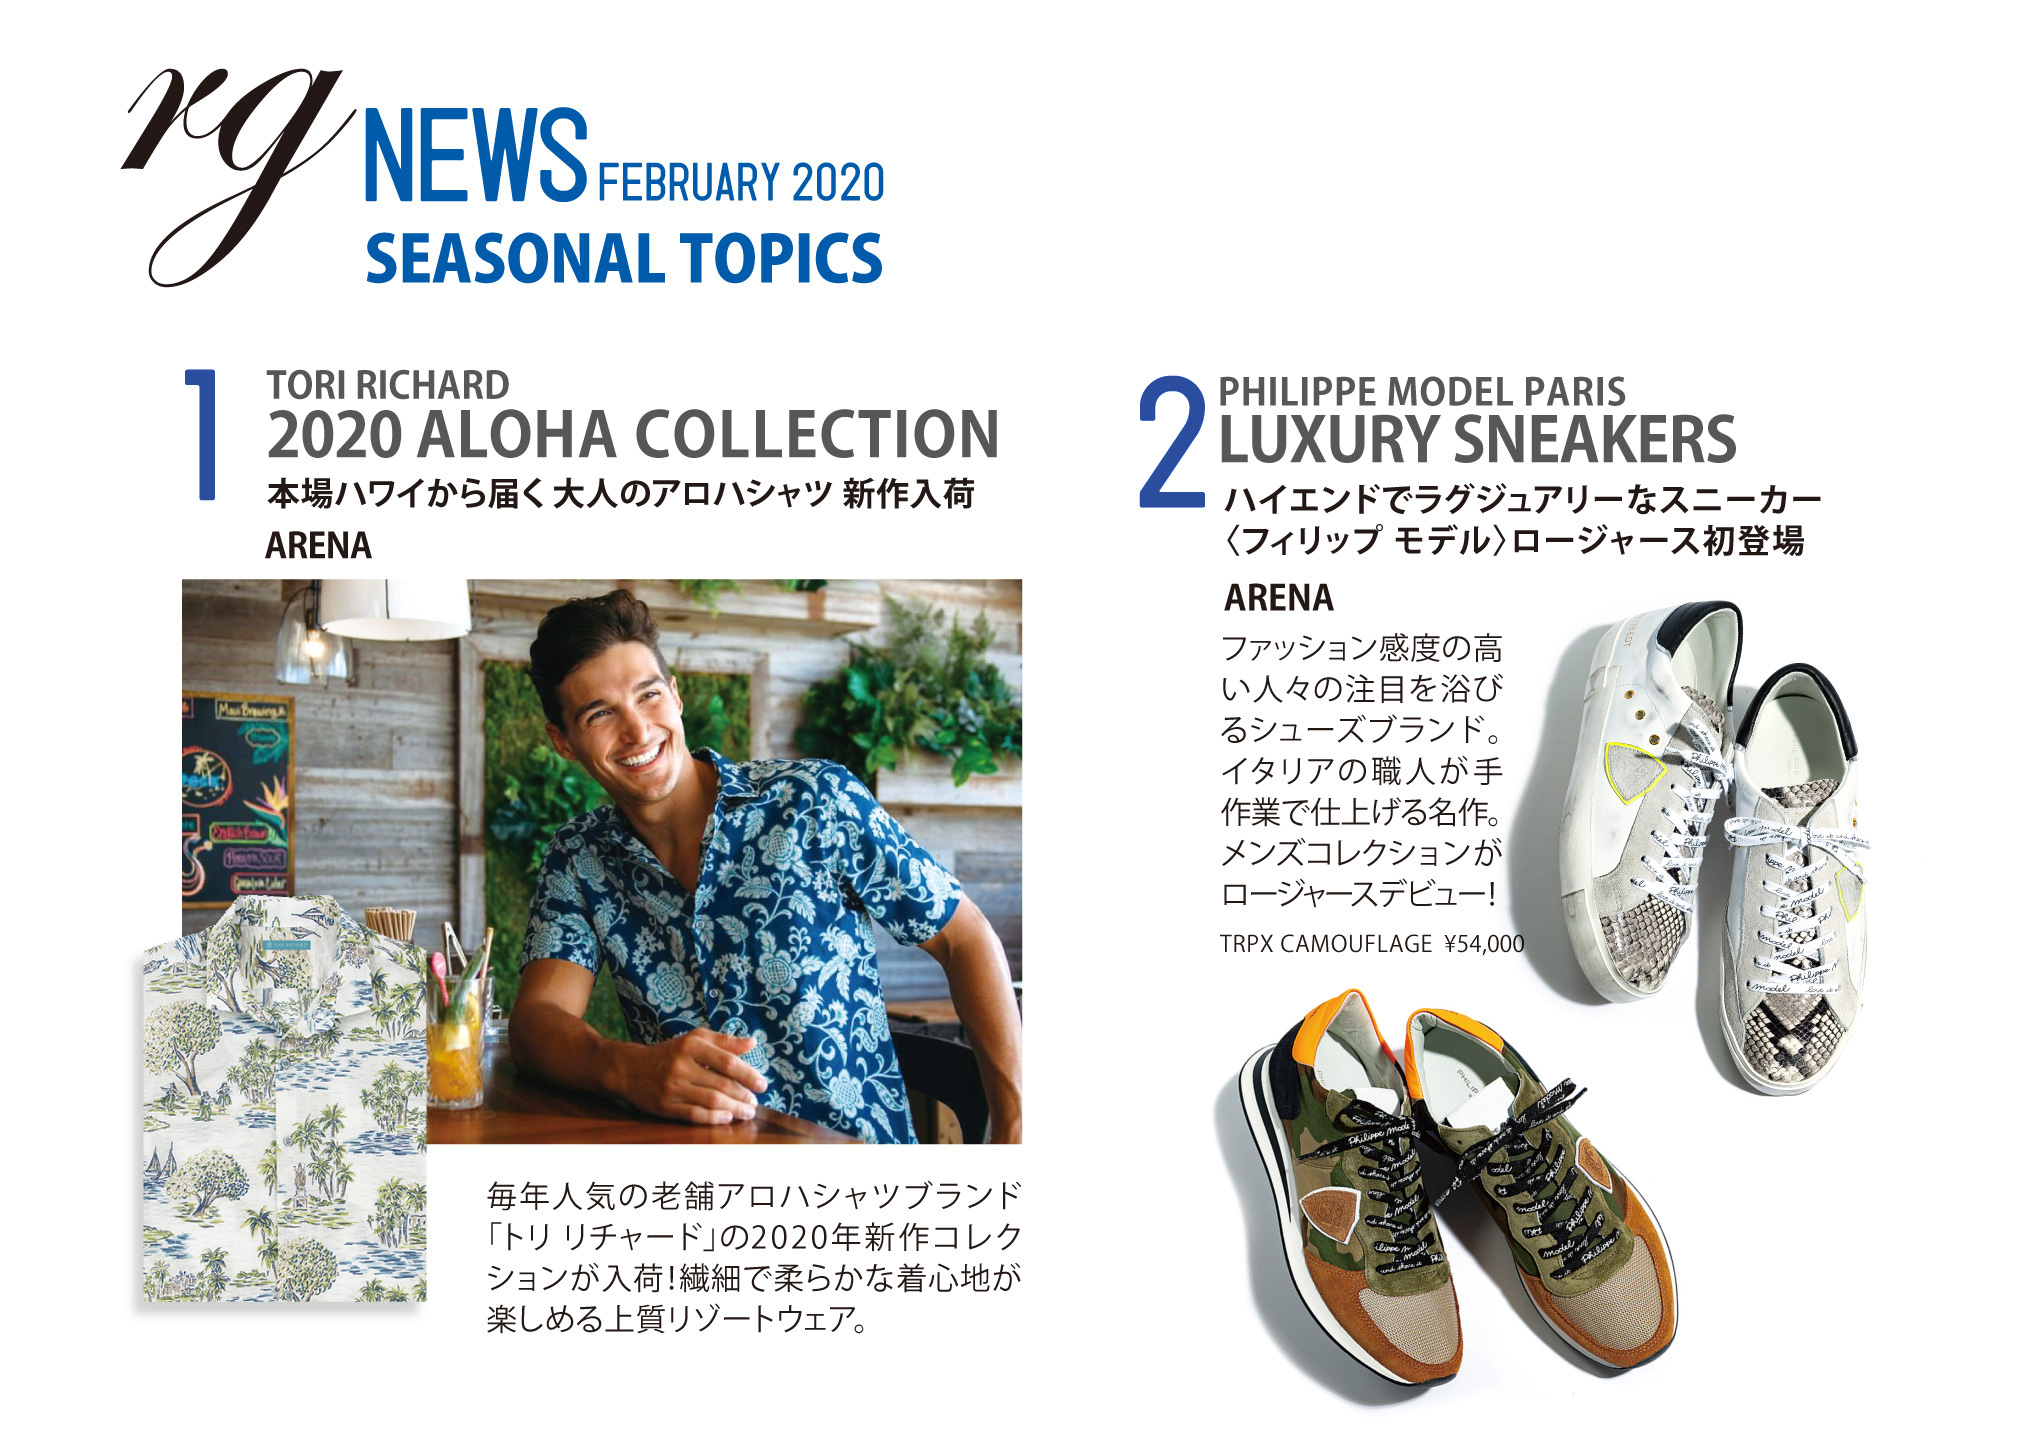 SEASONAL TOPICS 1-2 本場ハワイから届く大人のアロハ新作到着!